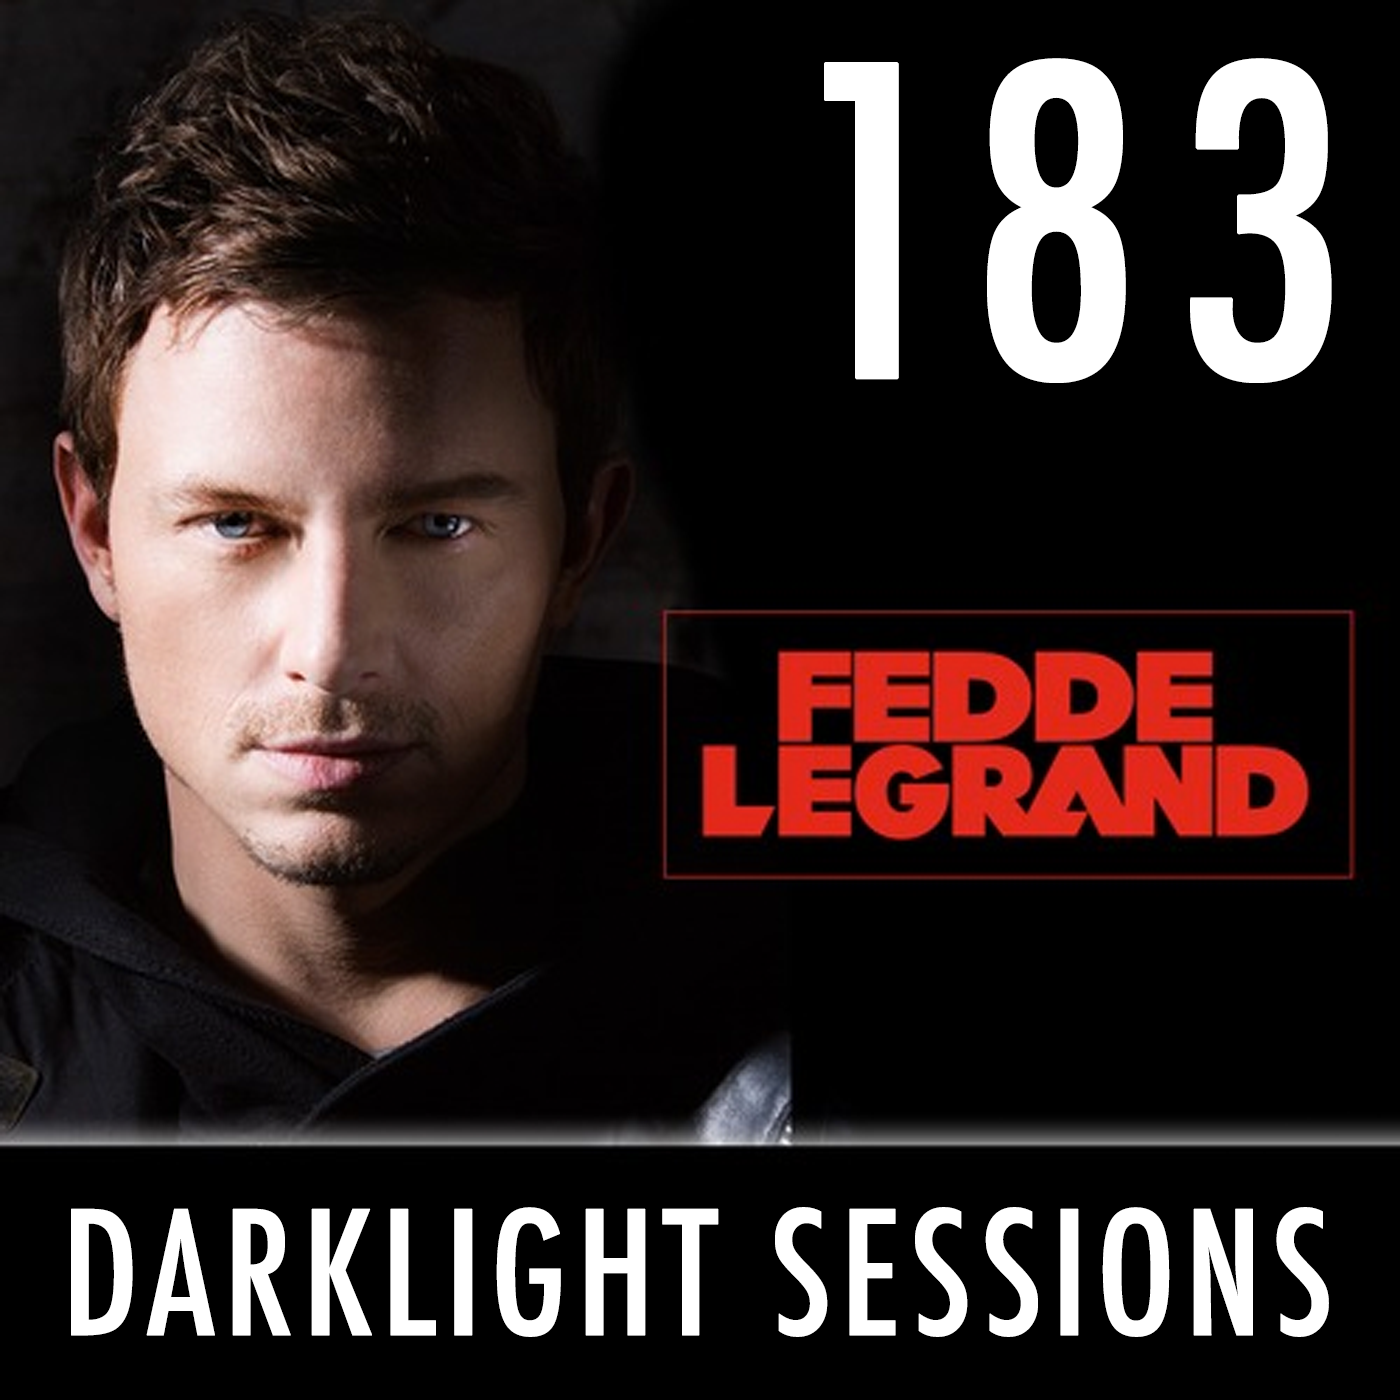 Darklight Sessions 183